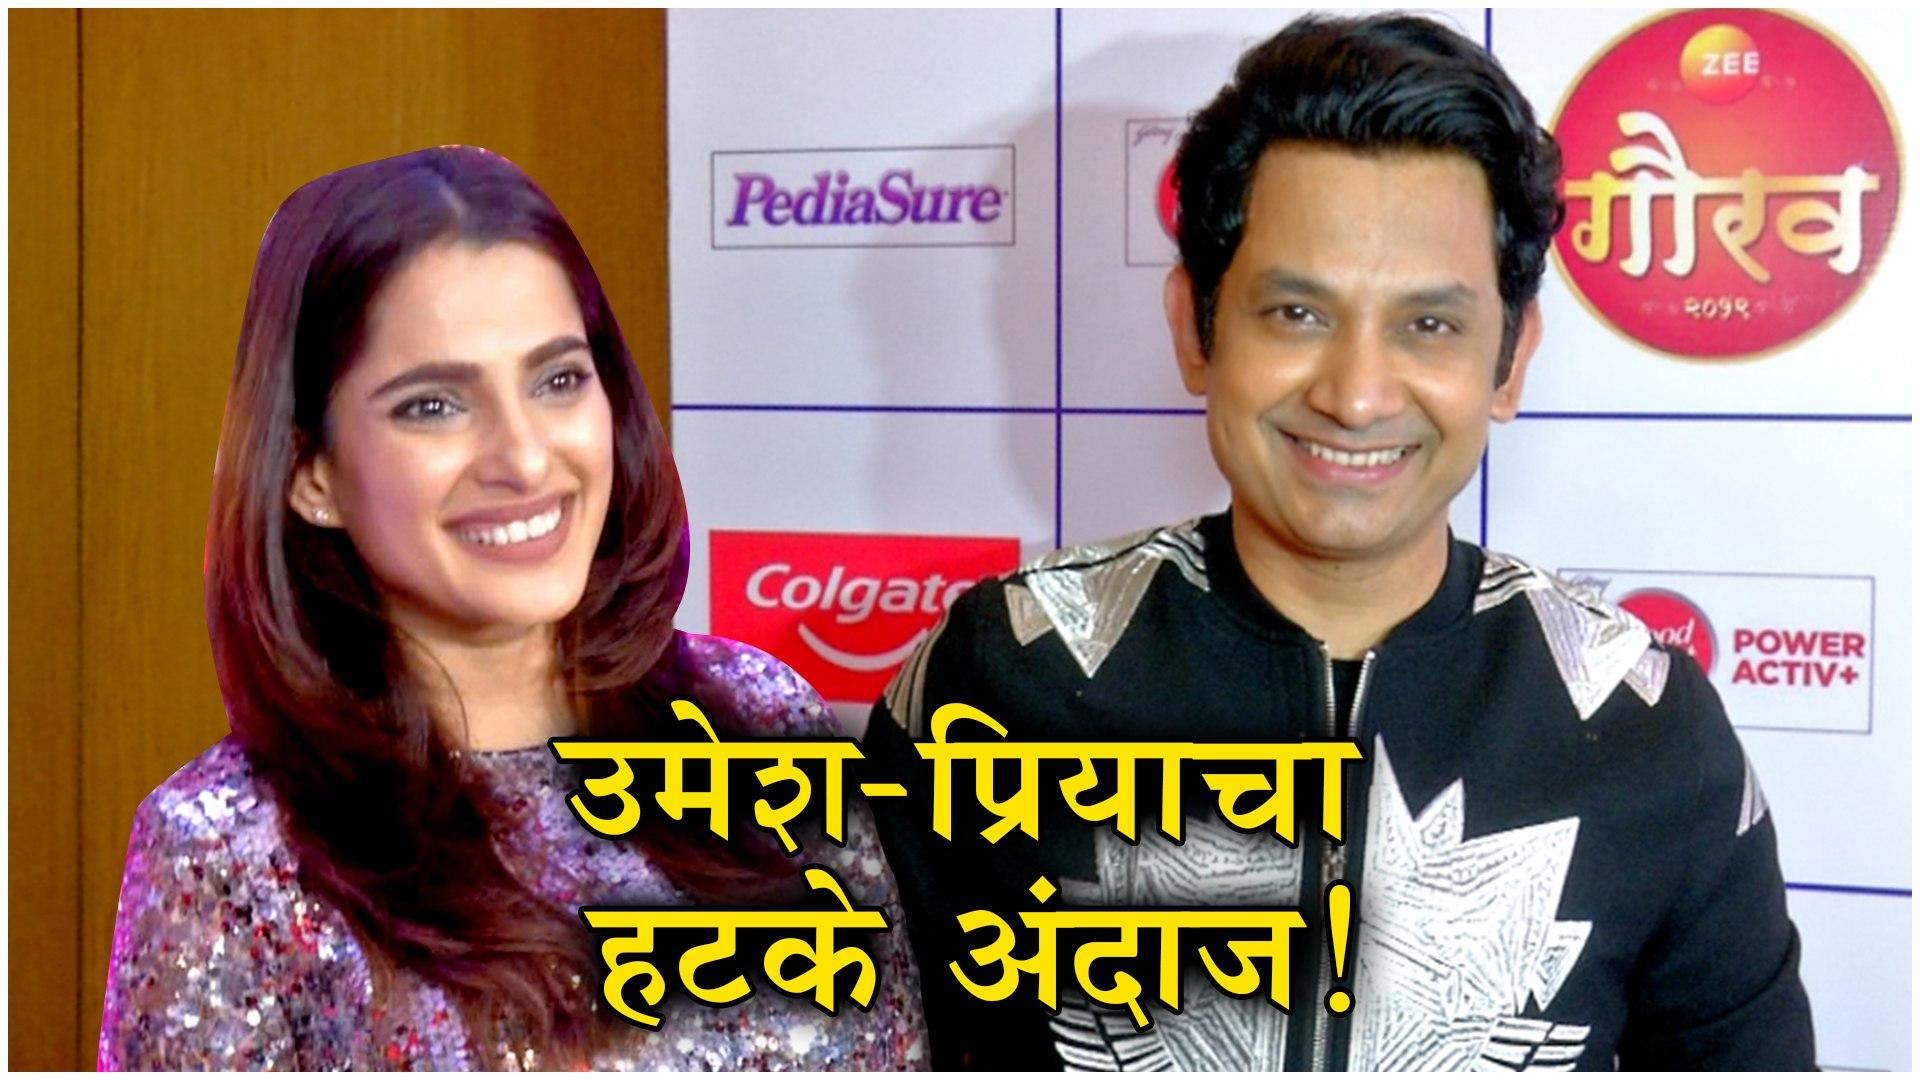 Zee Gaurav Puraskar 2019   Priya Bapat & Umesh Kamat   New Look   Time Pass 2, Time Please